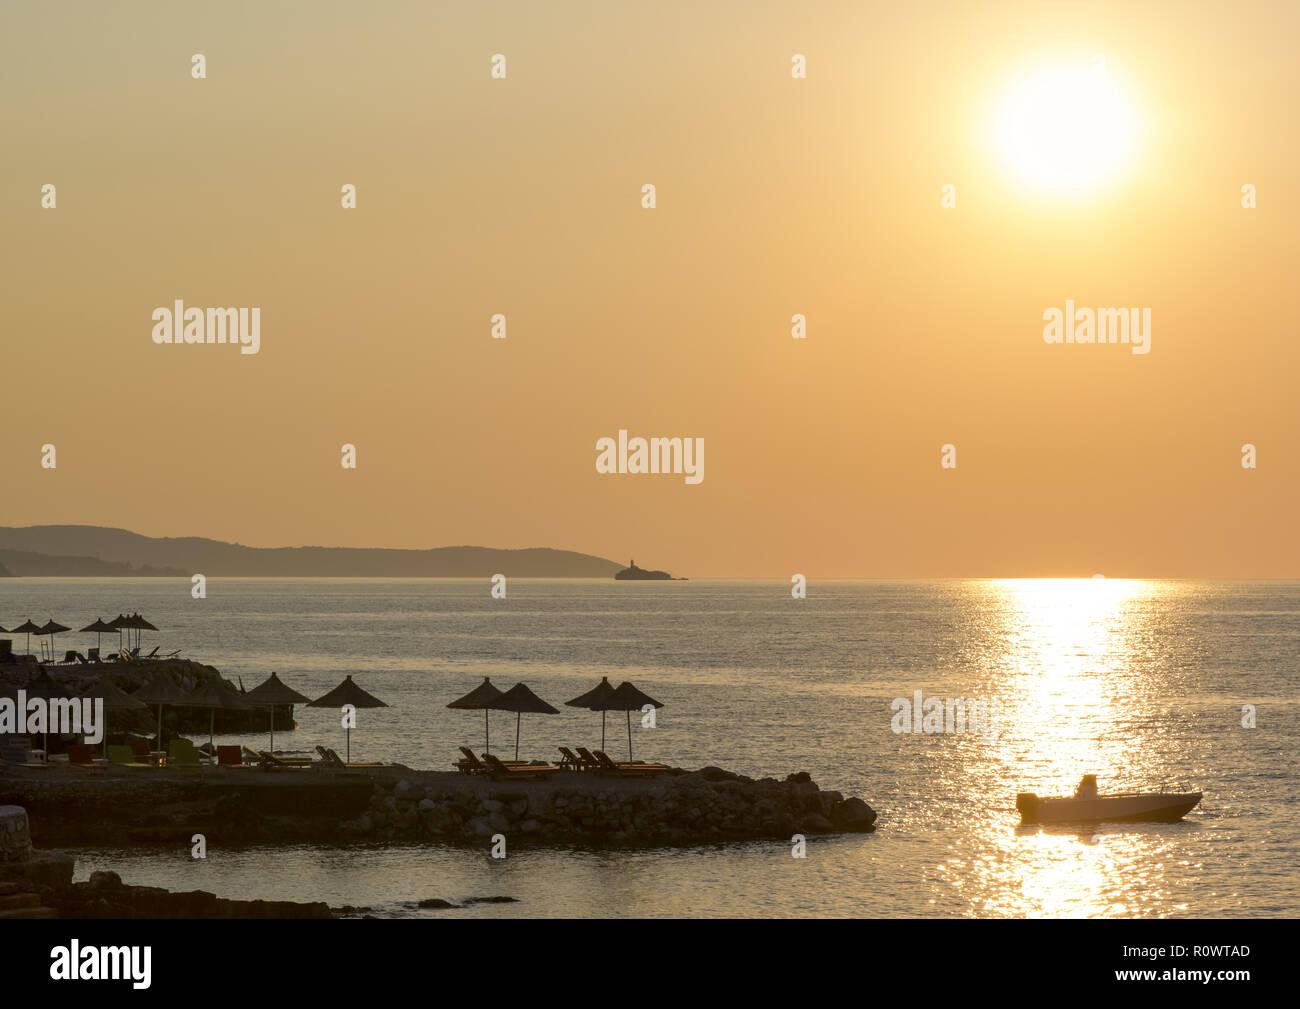 Sonnenuntergang am Strand, Ksamil, Albanien - Stock Image